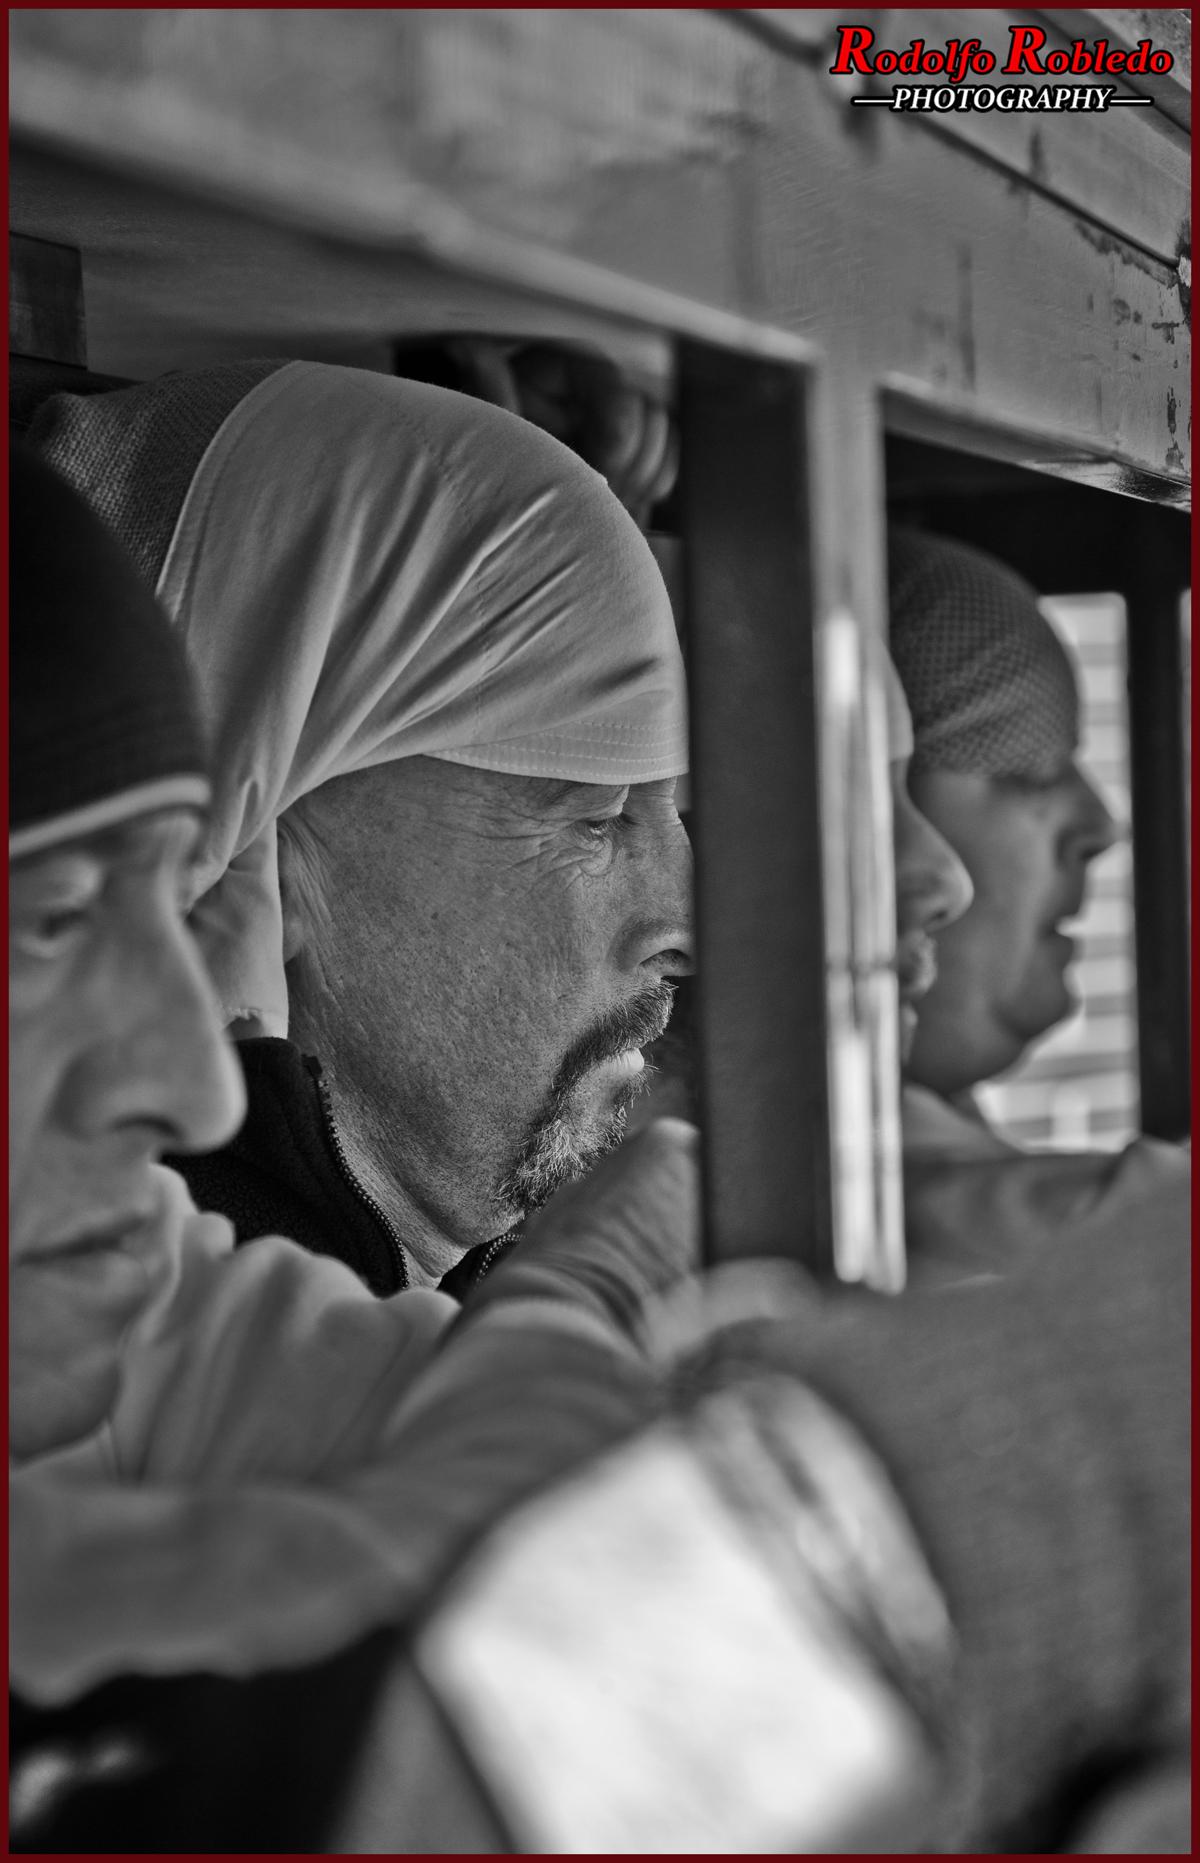 ENSAYO COSTALEROS 20016 - Rodolfo Robledo 07/02/2016 22